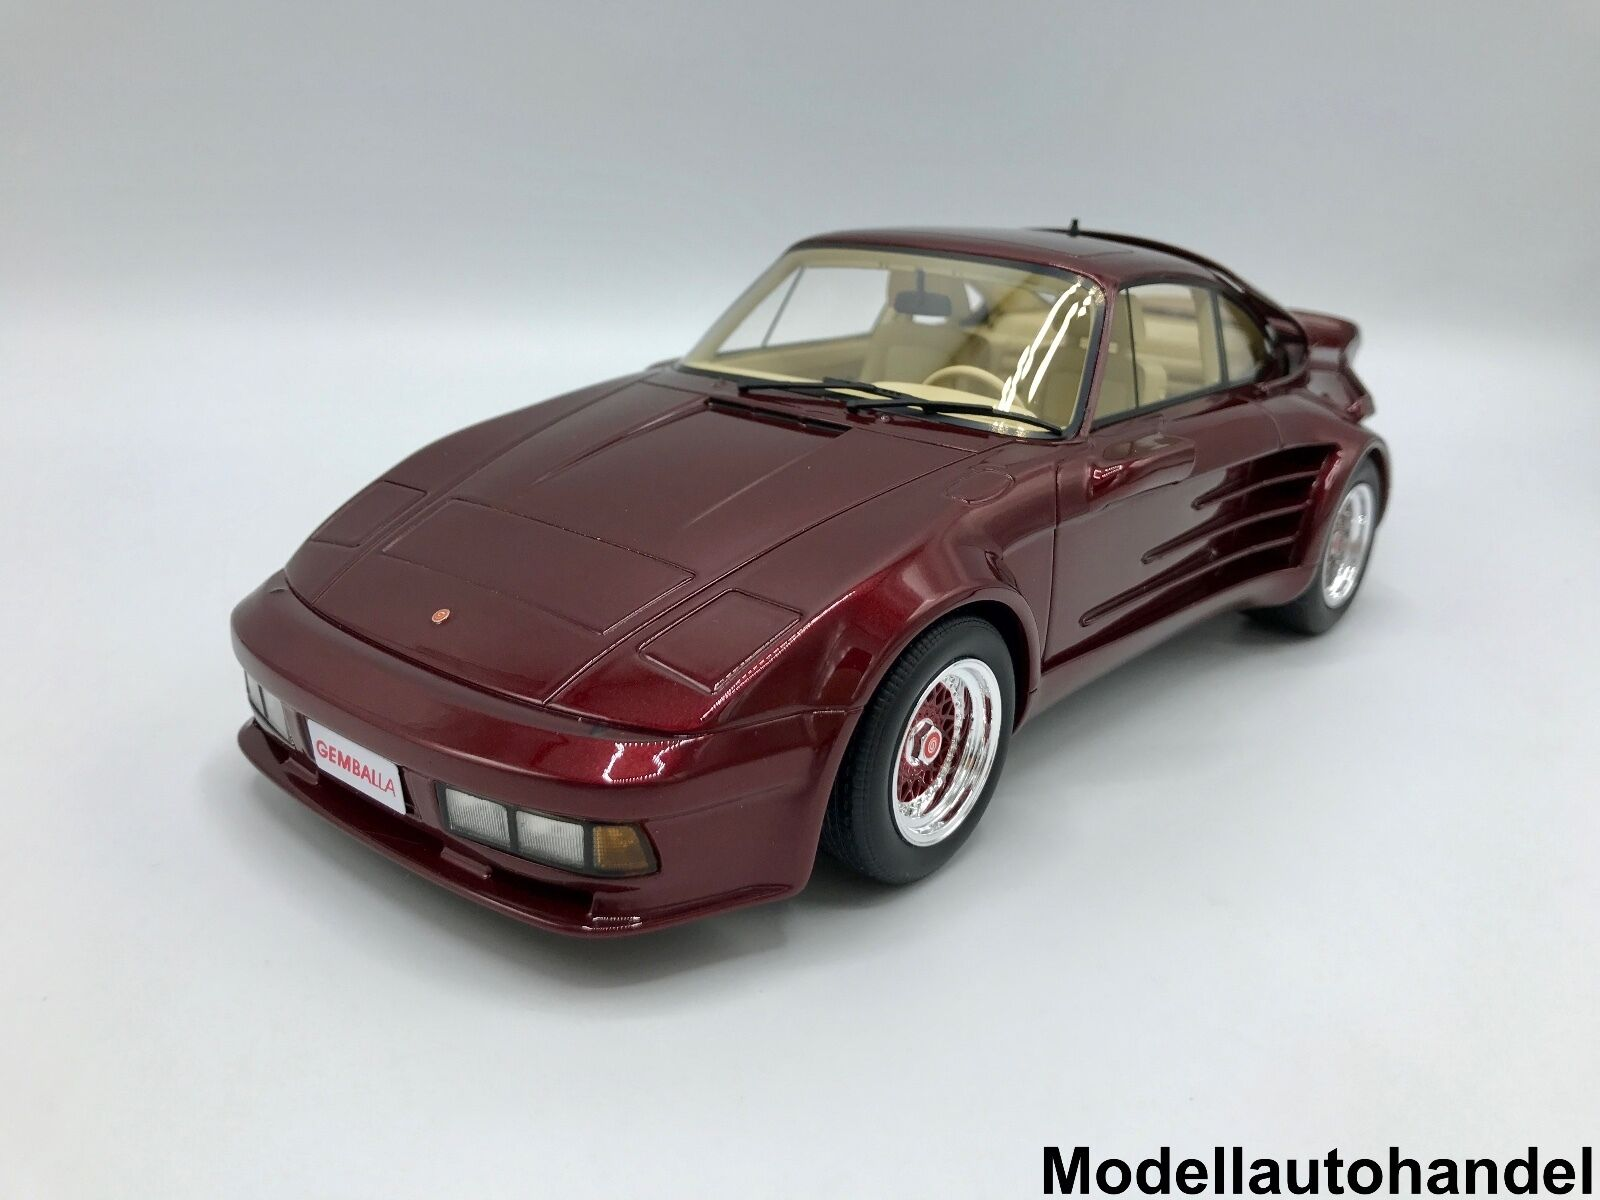 Porsche 911 Turbo Gemballa Avalanche met. - dunkelrred 1 18 BOS    NEW